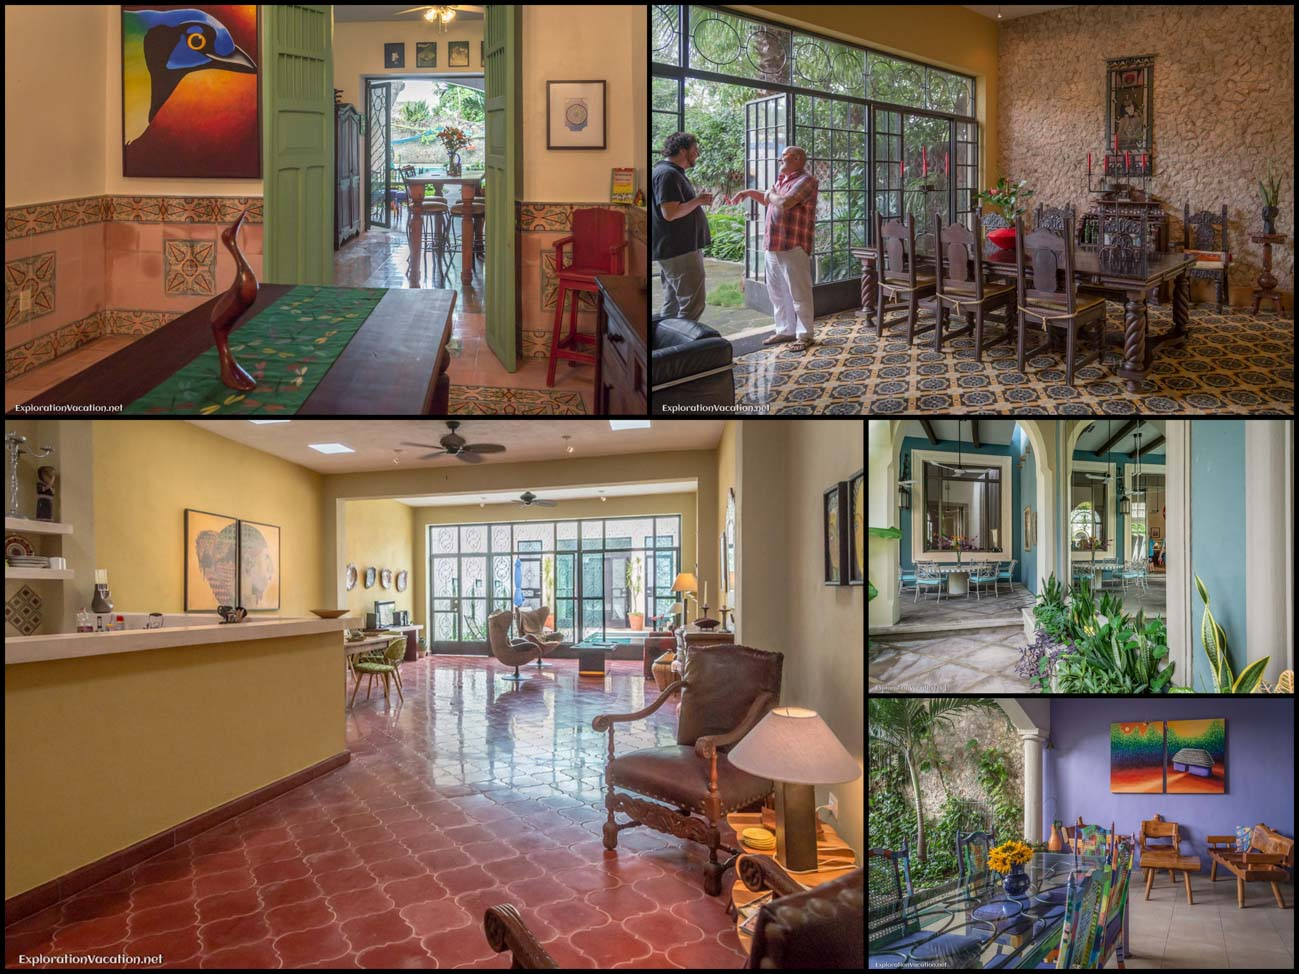 Merida Mexico house tour - 12 living spaces - ExplorationVacation